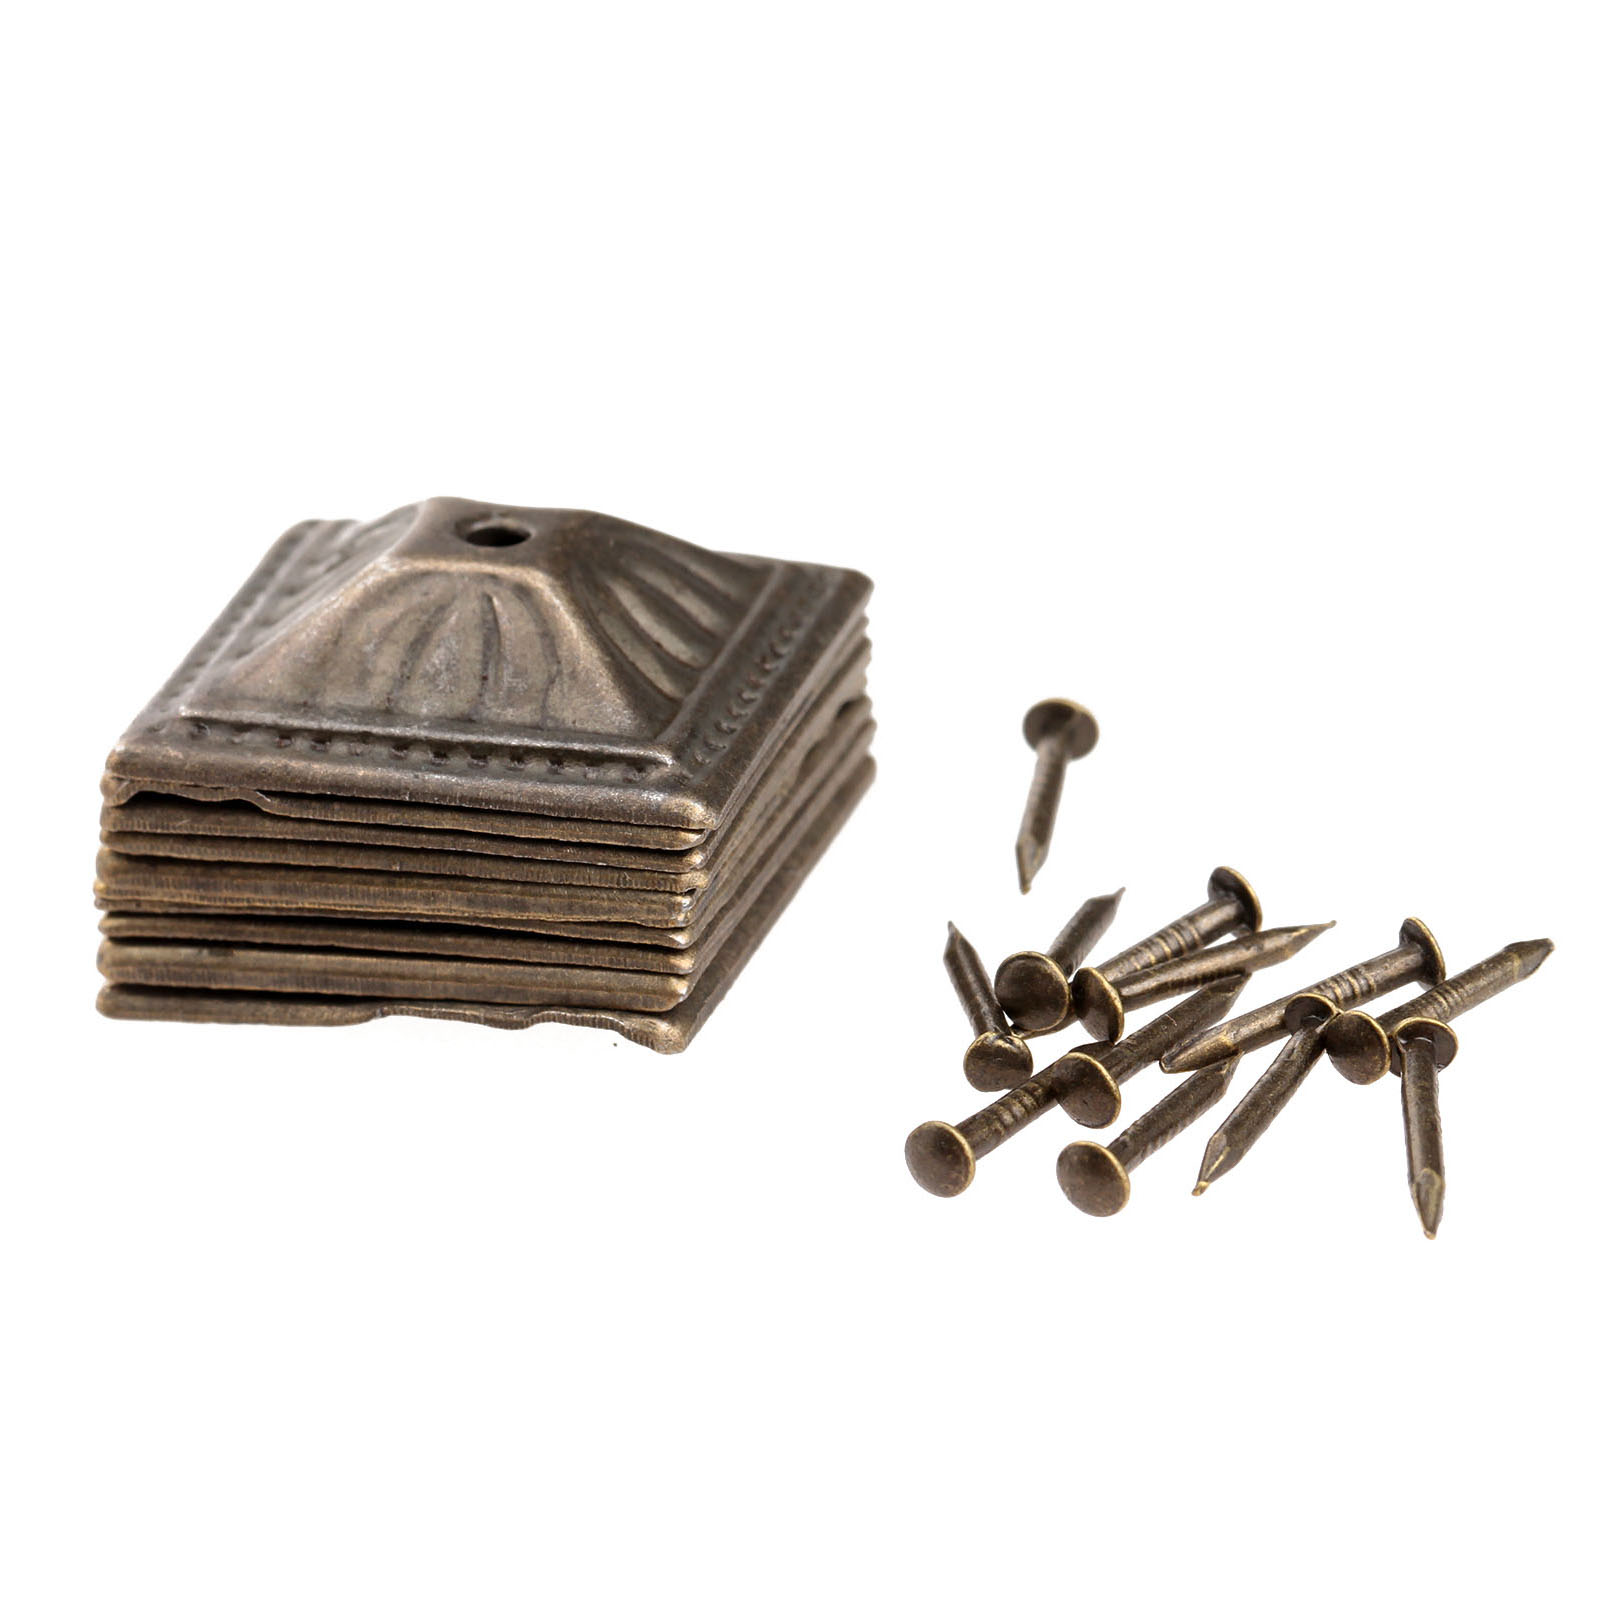 Купить с кэшбэком 50Pcs Antique Bronze Square Nailhead Upholstery Decorative Nails Tack Stud Jewelry Wooden Box Furniture Pushpin Doornail 21x21mm